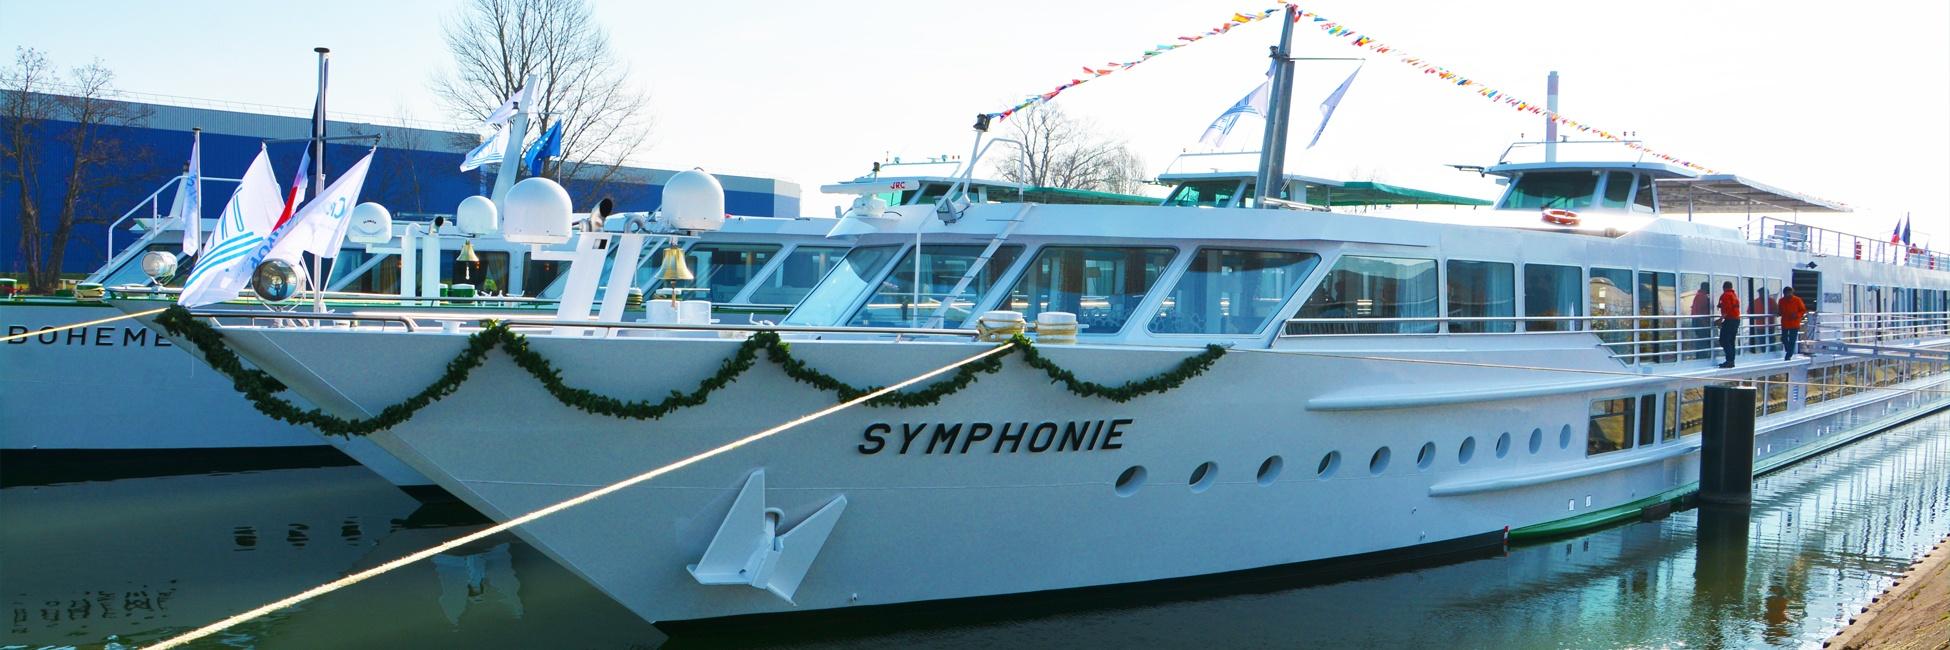 MS Symphonie à quai